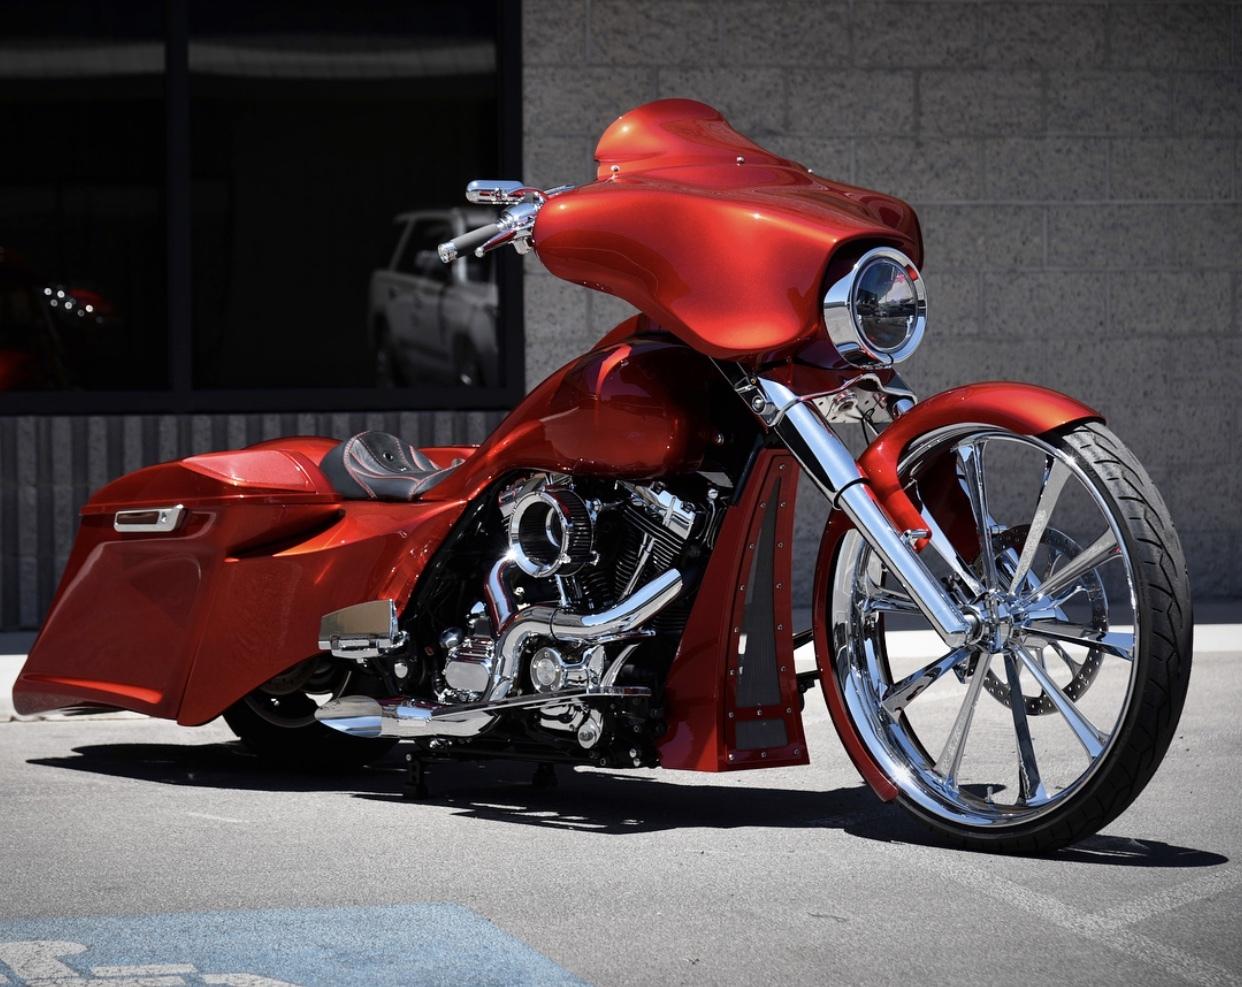 Photo 2009 Harley-Davidson STREET GLIDE $29999497.98497.98